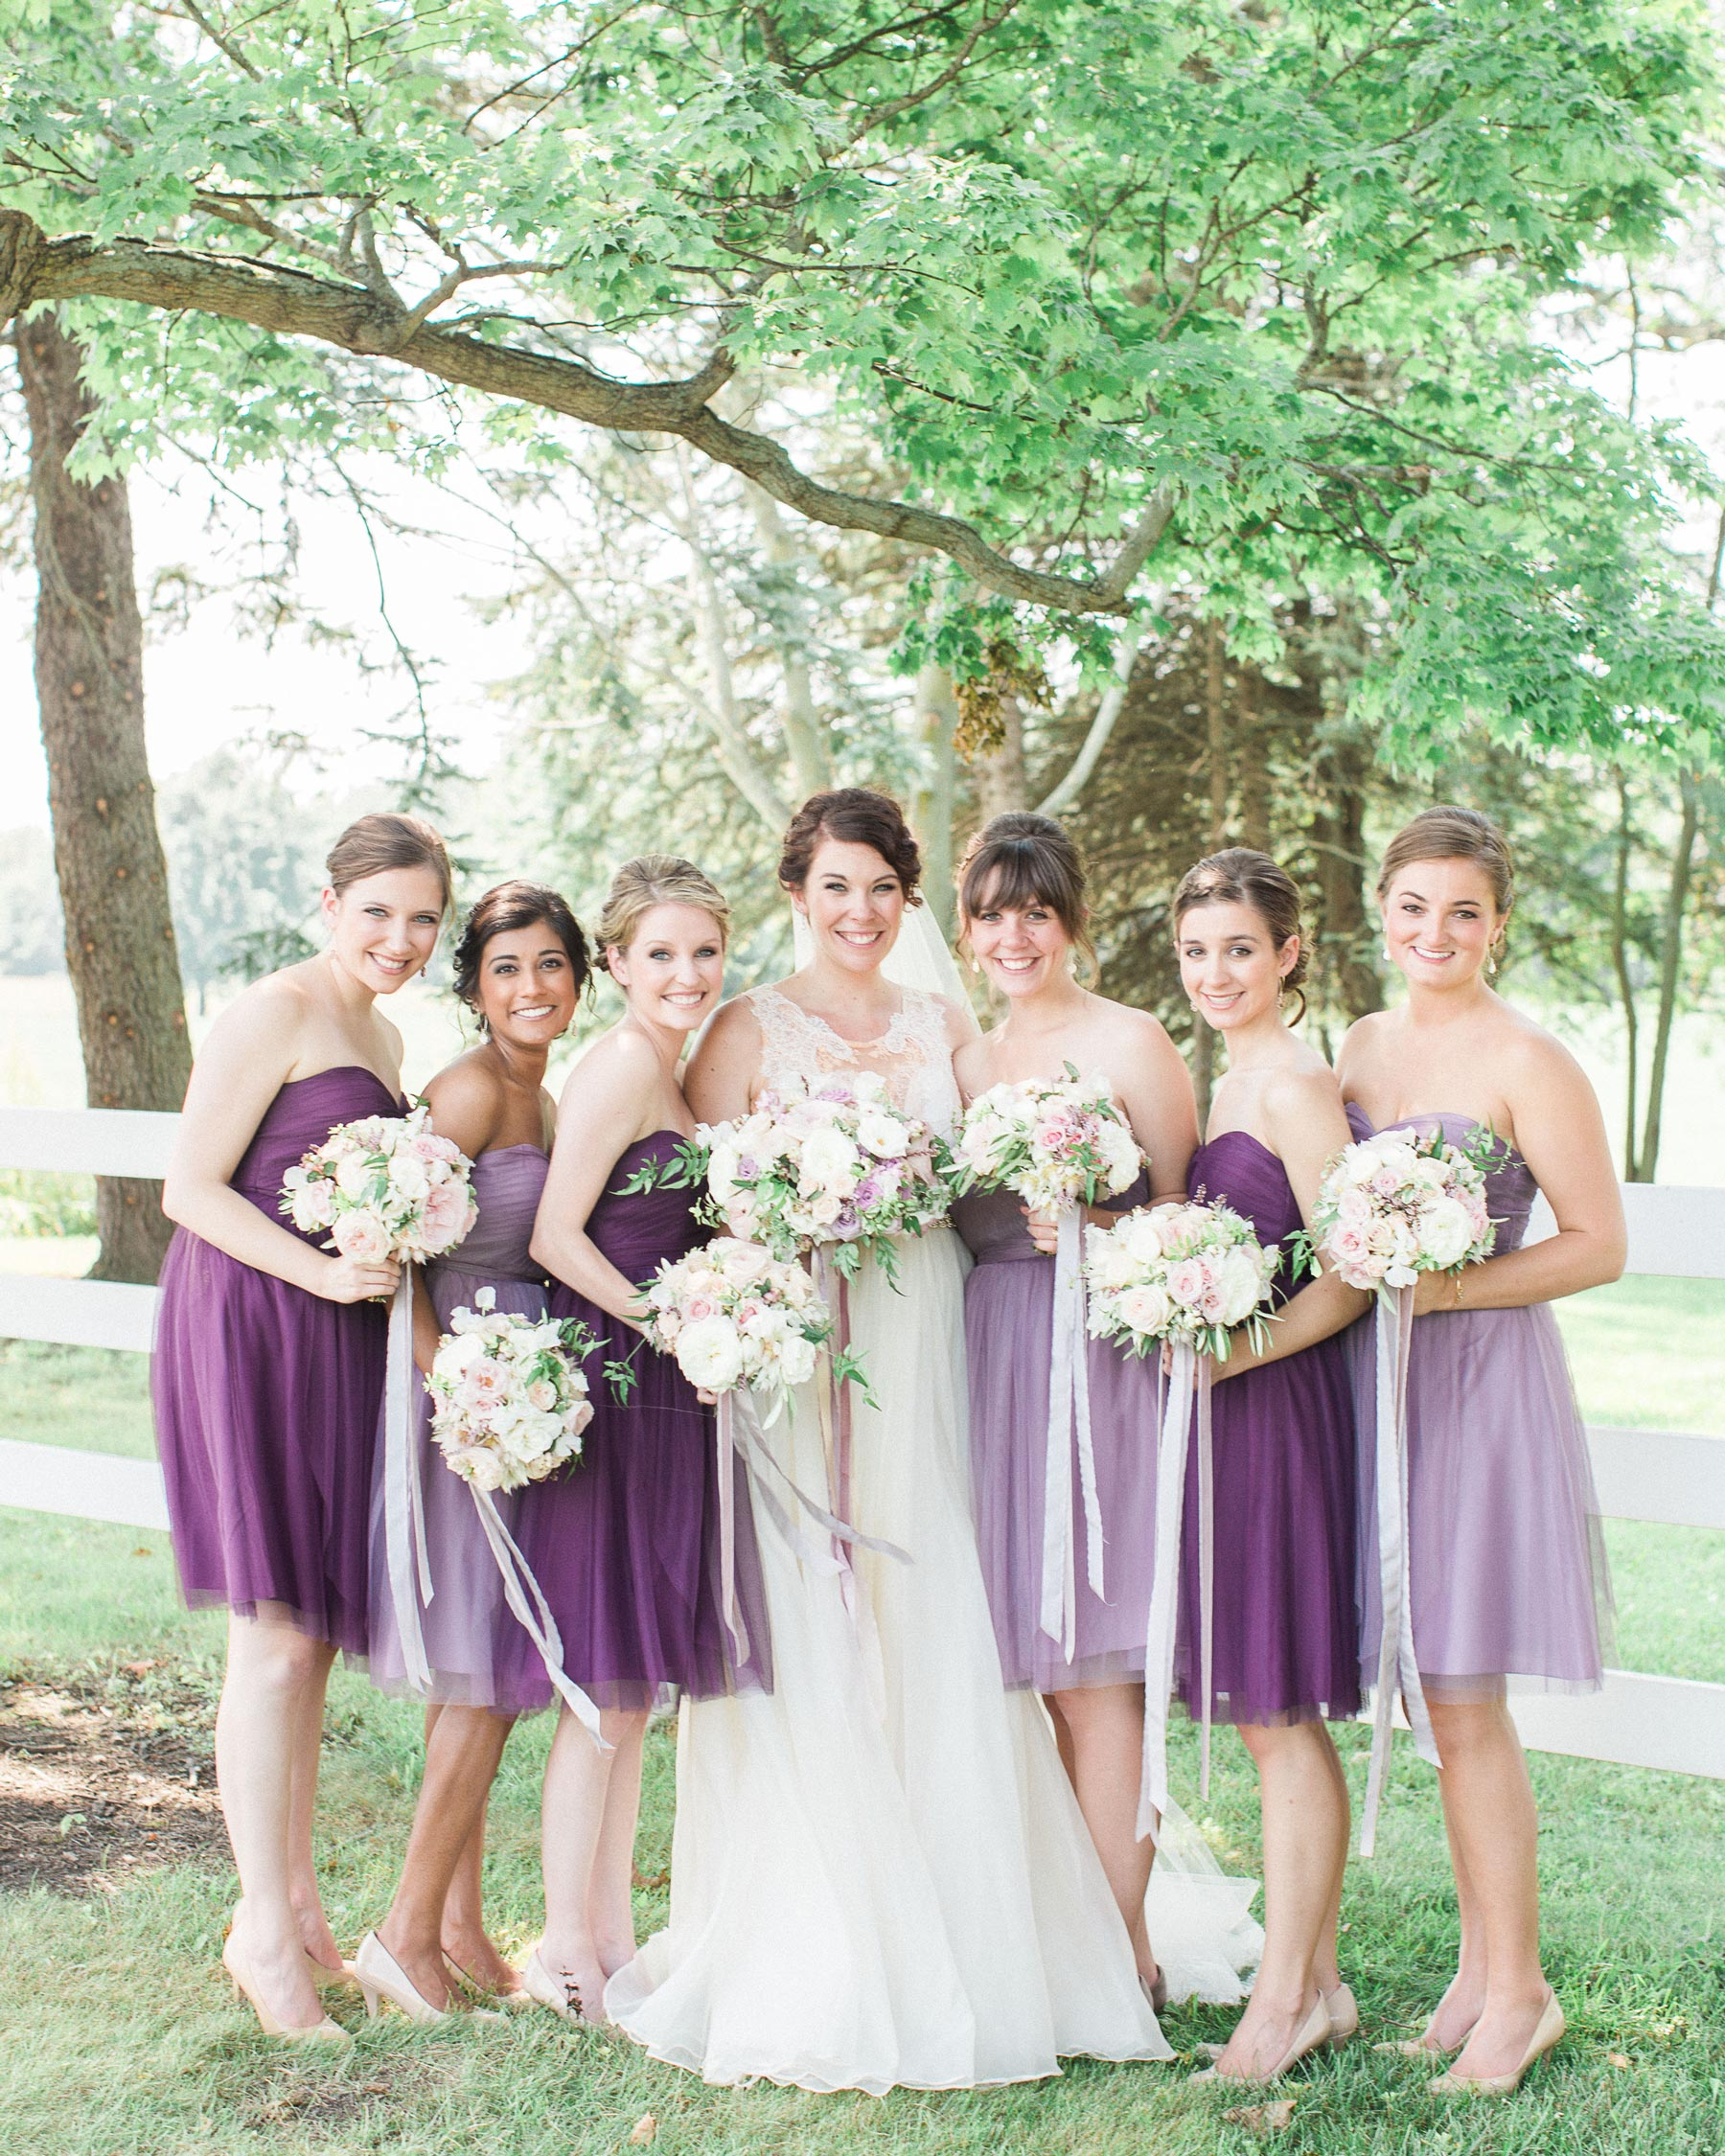 sarah-michael-wedding-purple-bridesmaids-356-s112783-0416.jpg